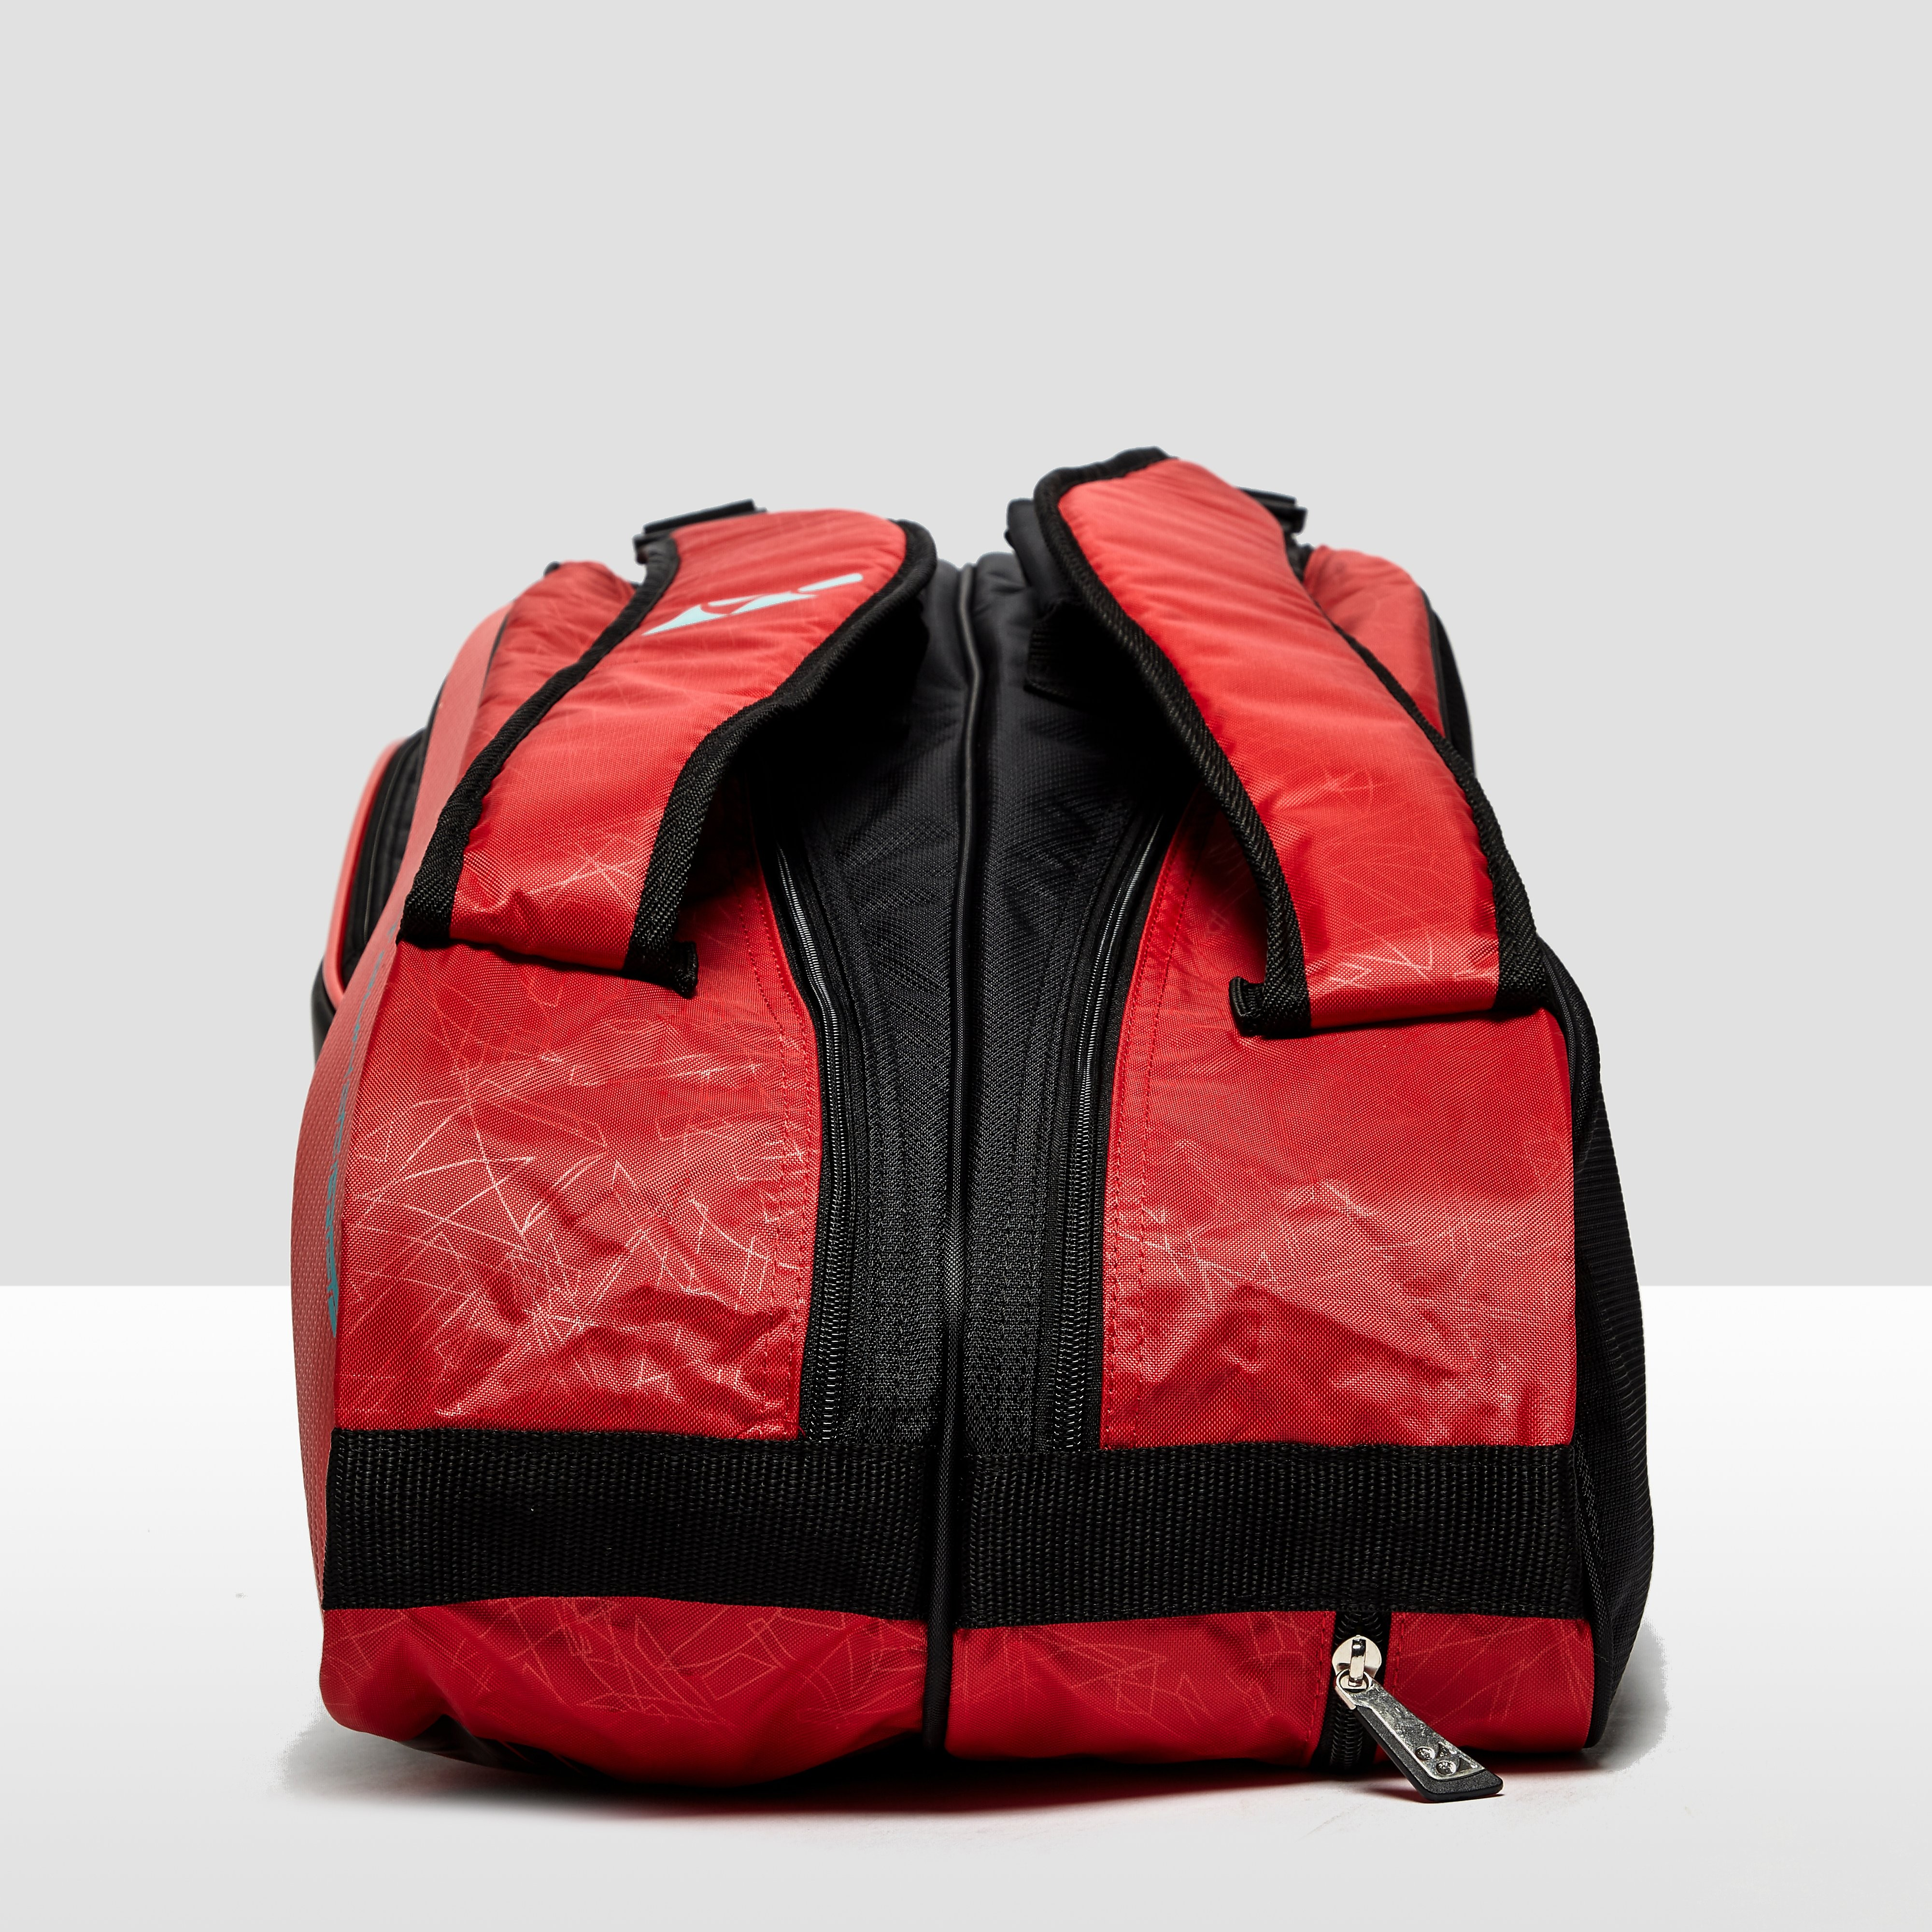 Yonex Pro X6 Racket Bag